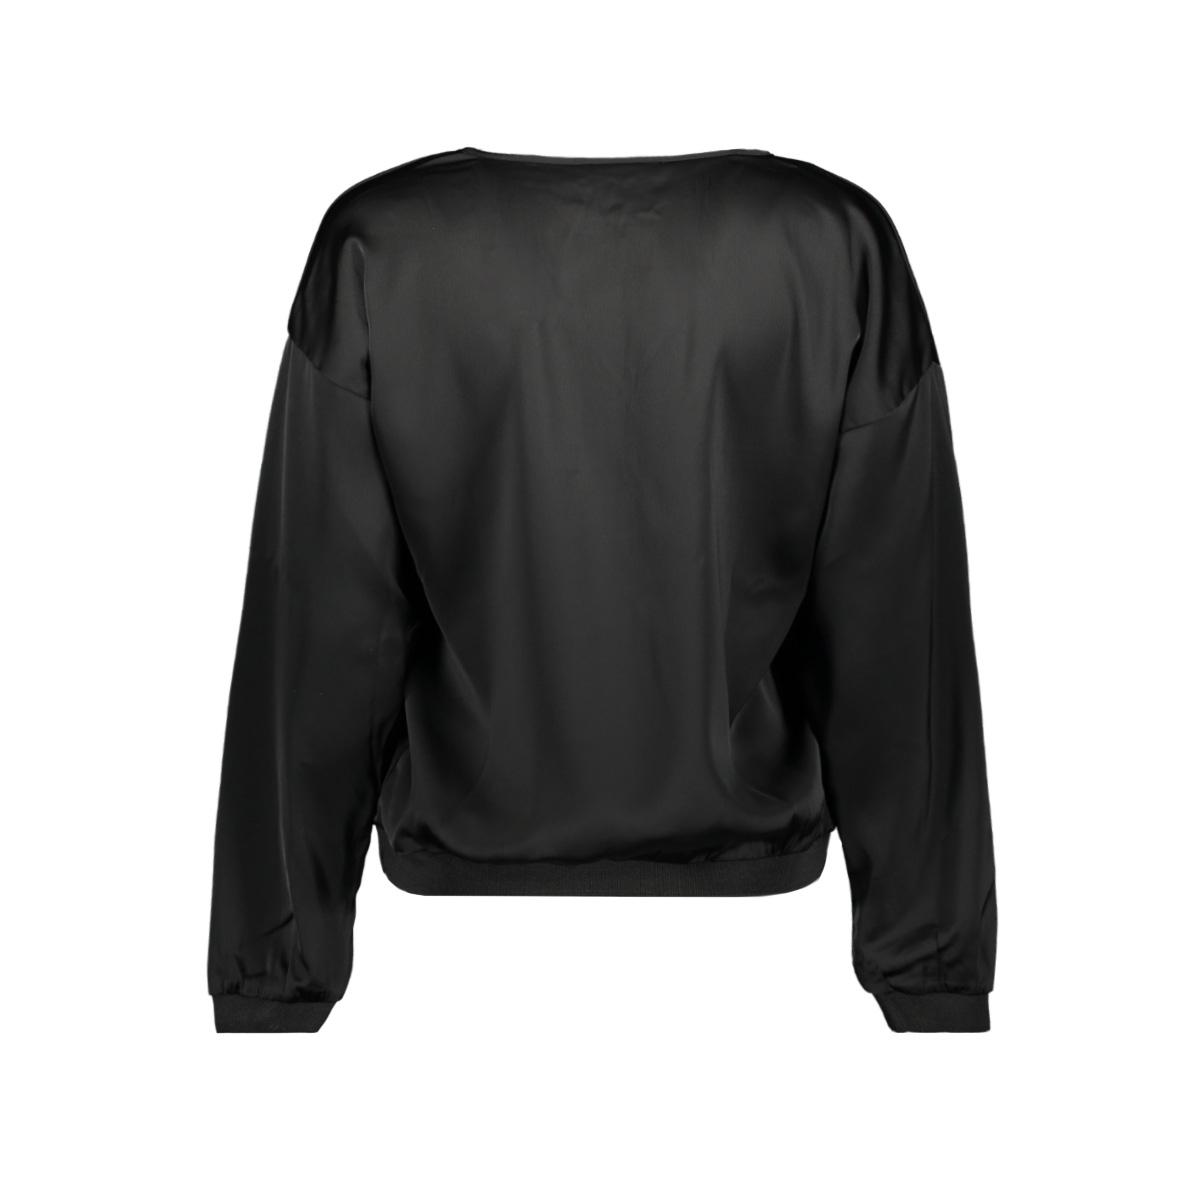 onydanna ls batsleeve top wvn 15185682 only blouse black